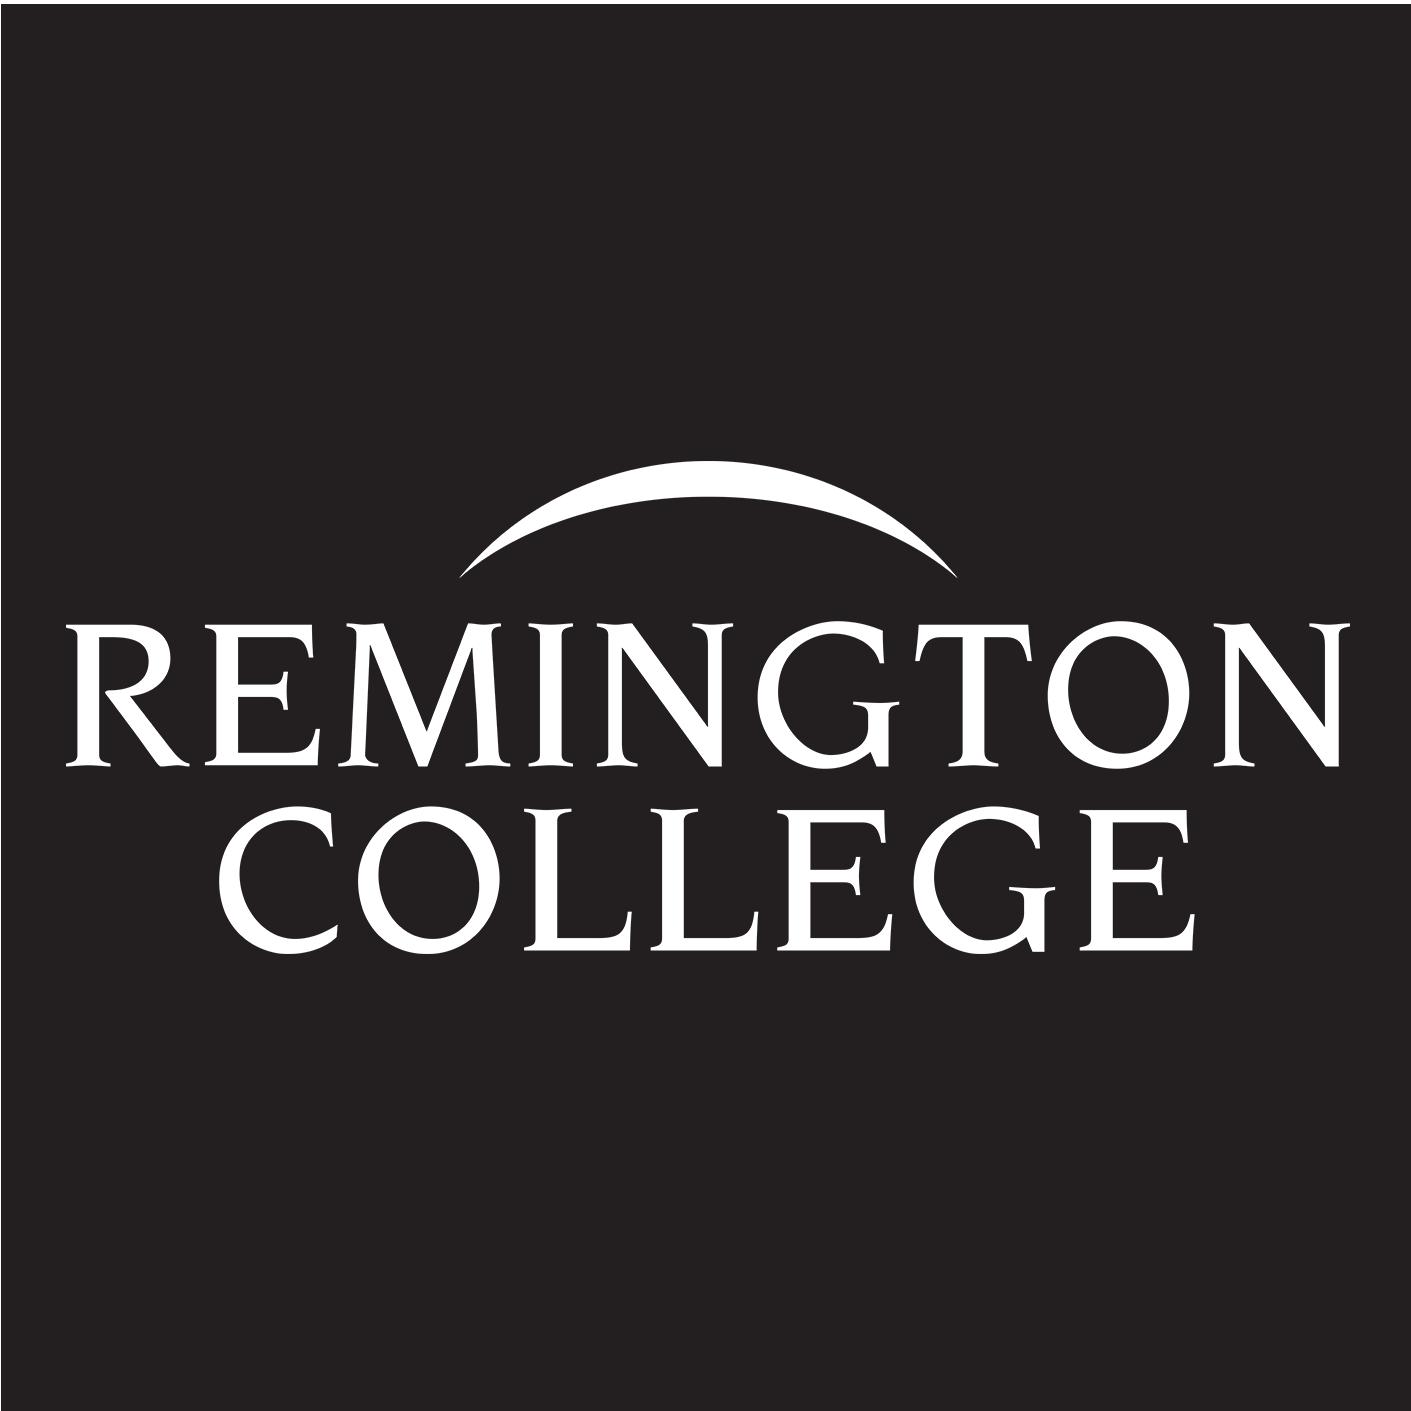 Remington College.png